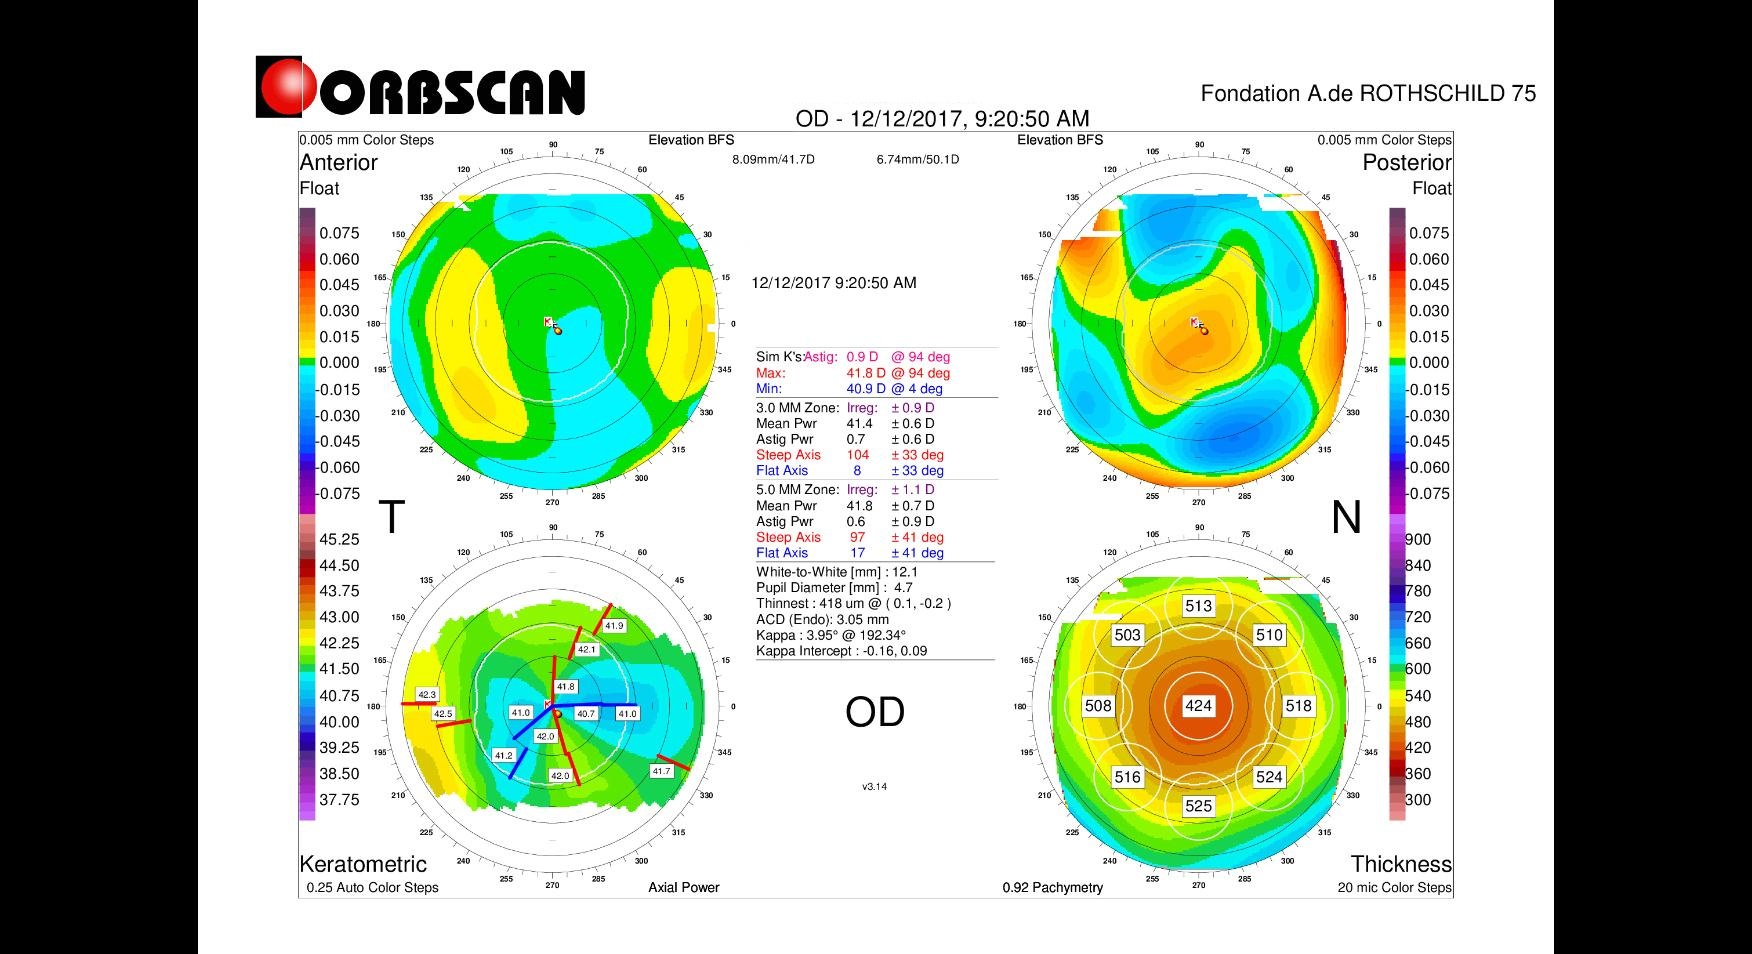 Orbscan right eye post myopic LASIK